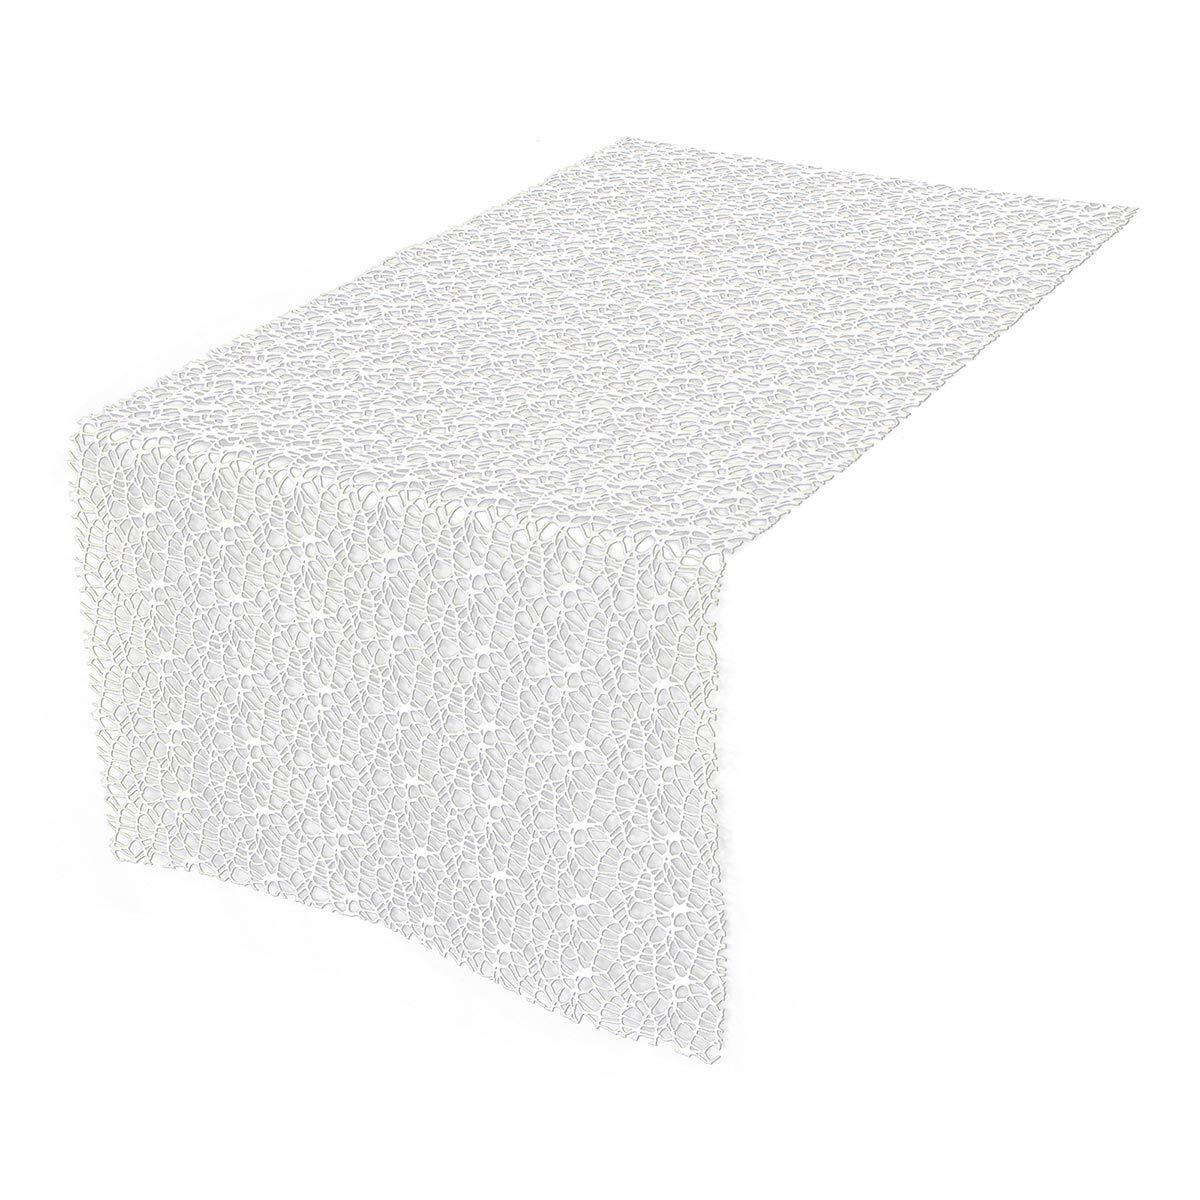 Yve! Tischdecke Netz